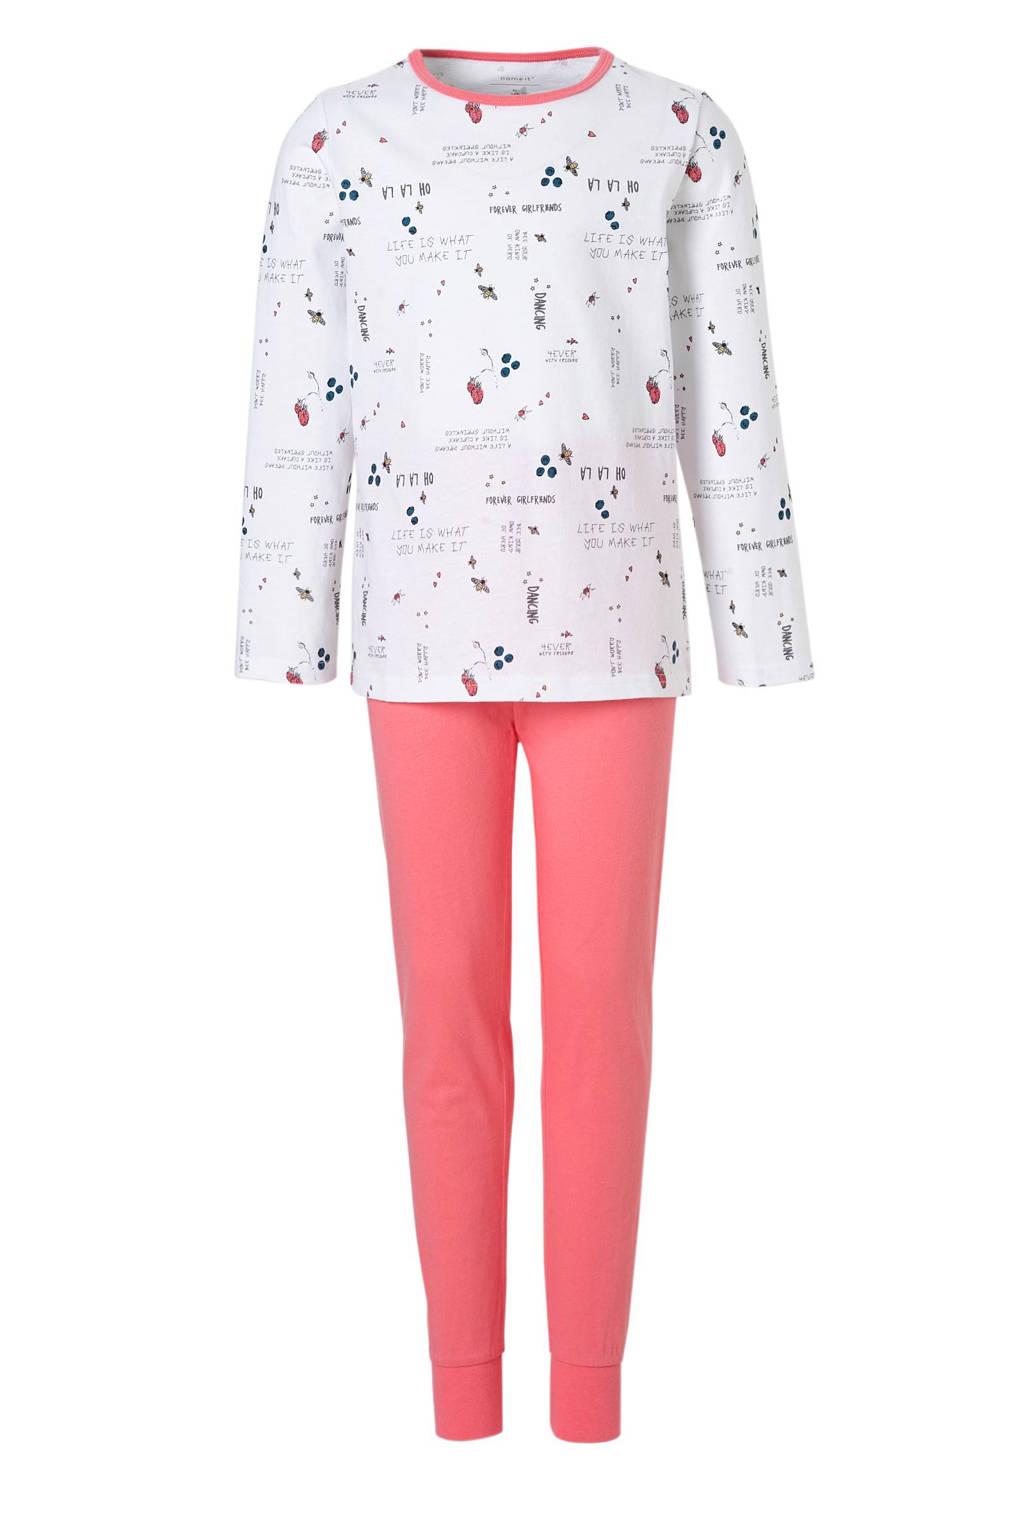 name it KIDS pyjama met tekst wit/roze, Wit/roze